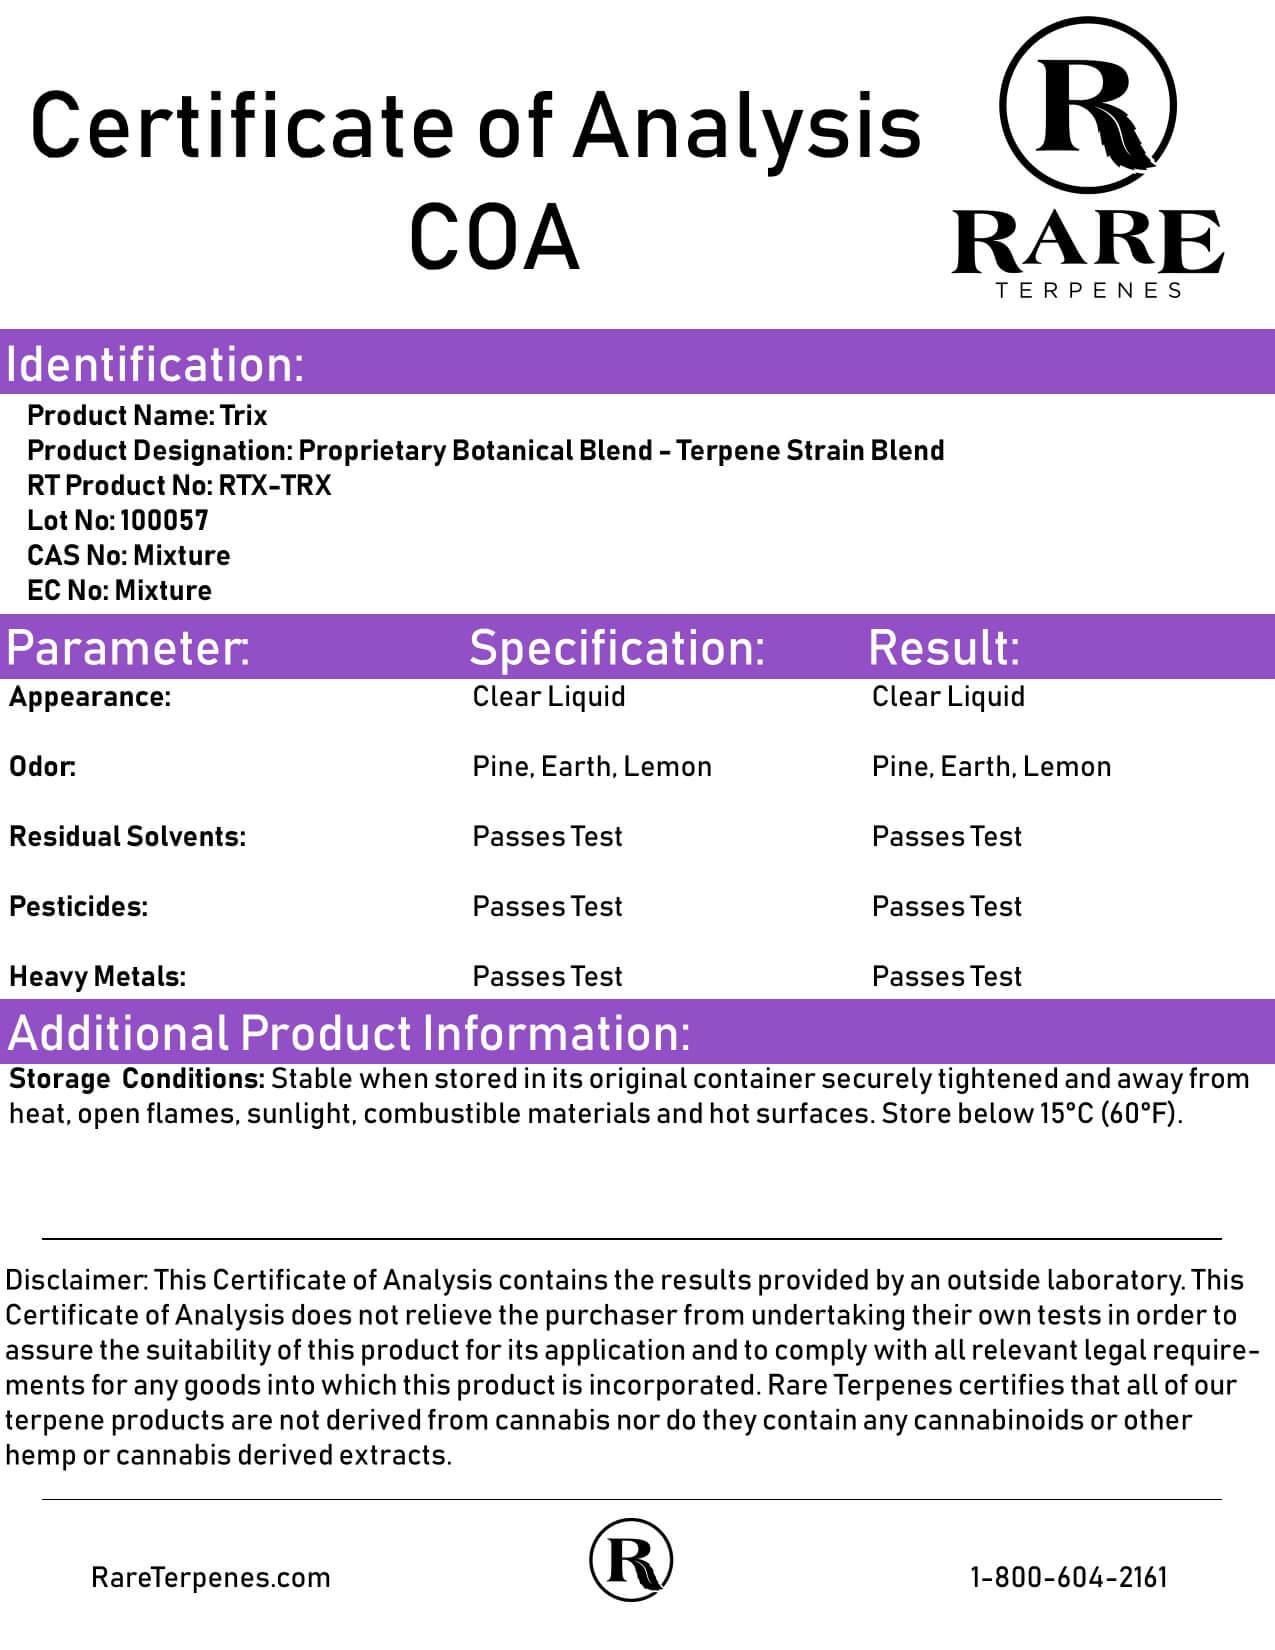 Rare Terpenes Tepene Strain Blends Trix Lab Report